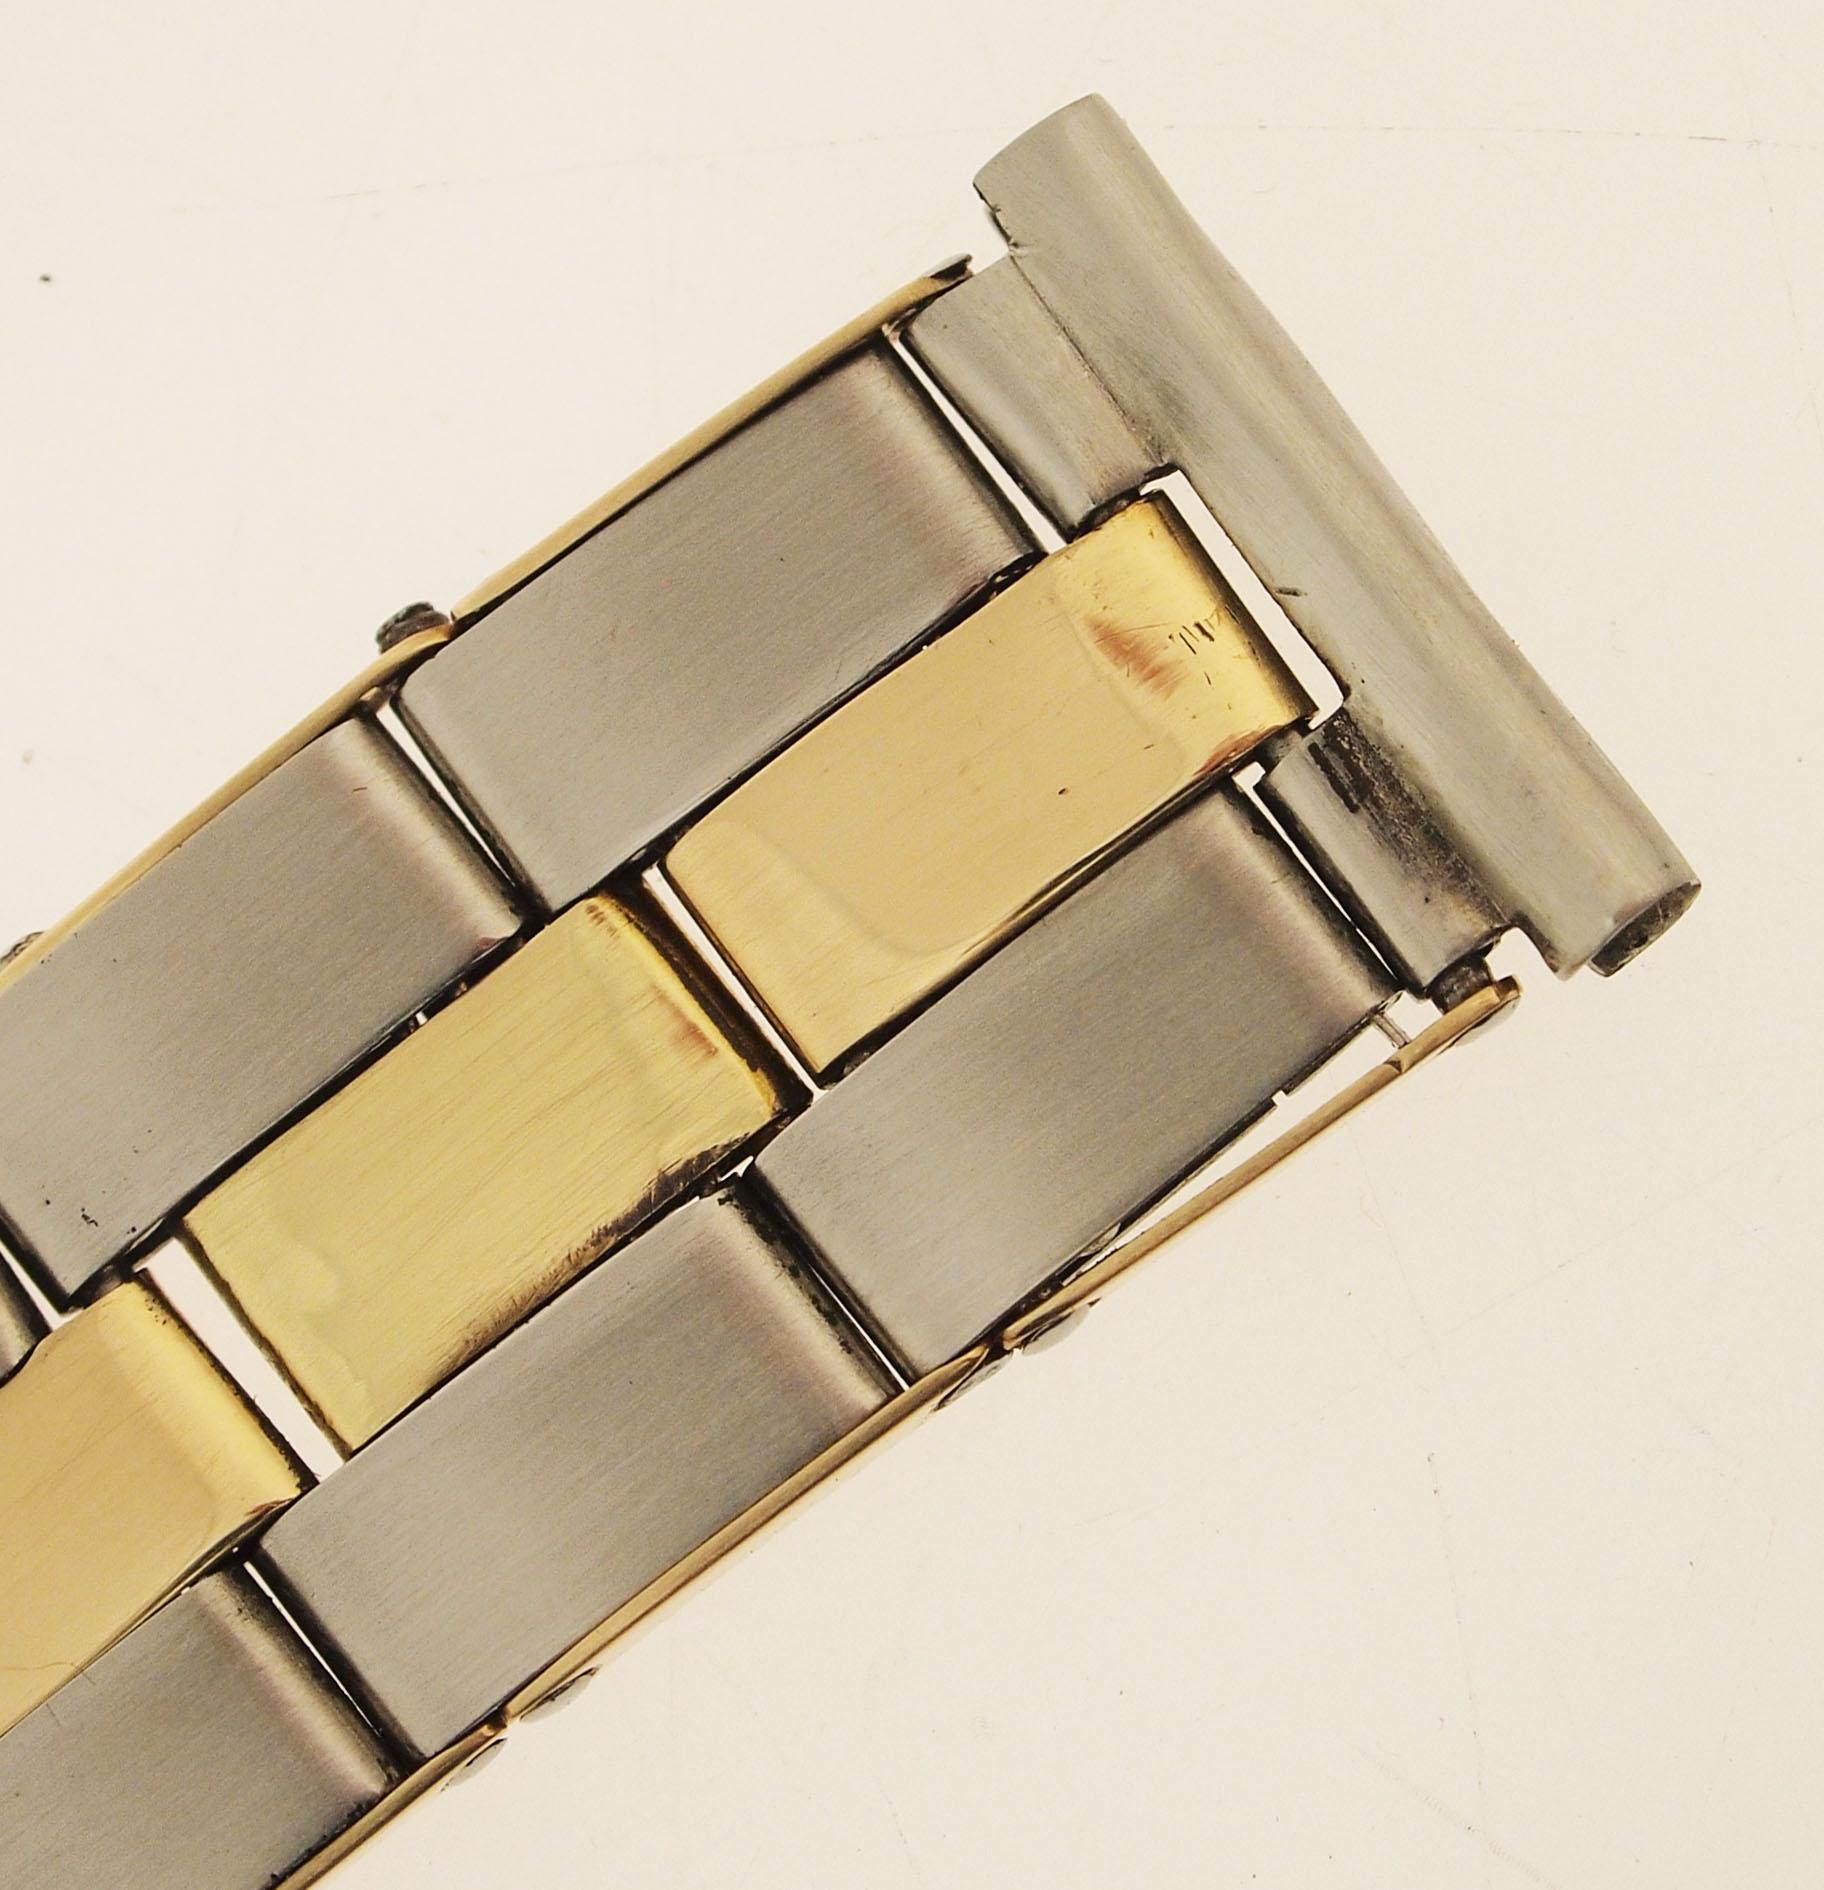 rolex flex armband stahl gold genietet 1940er jahre. Black Bedroom Furniture Sets. Home Design Ideas